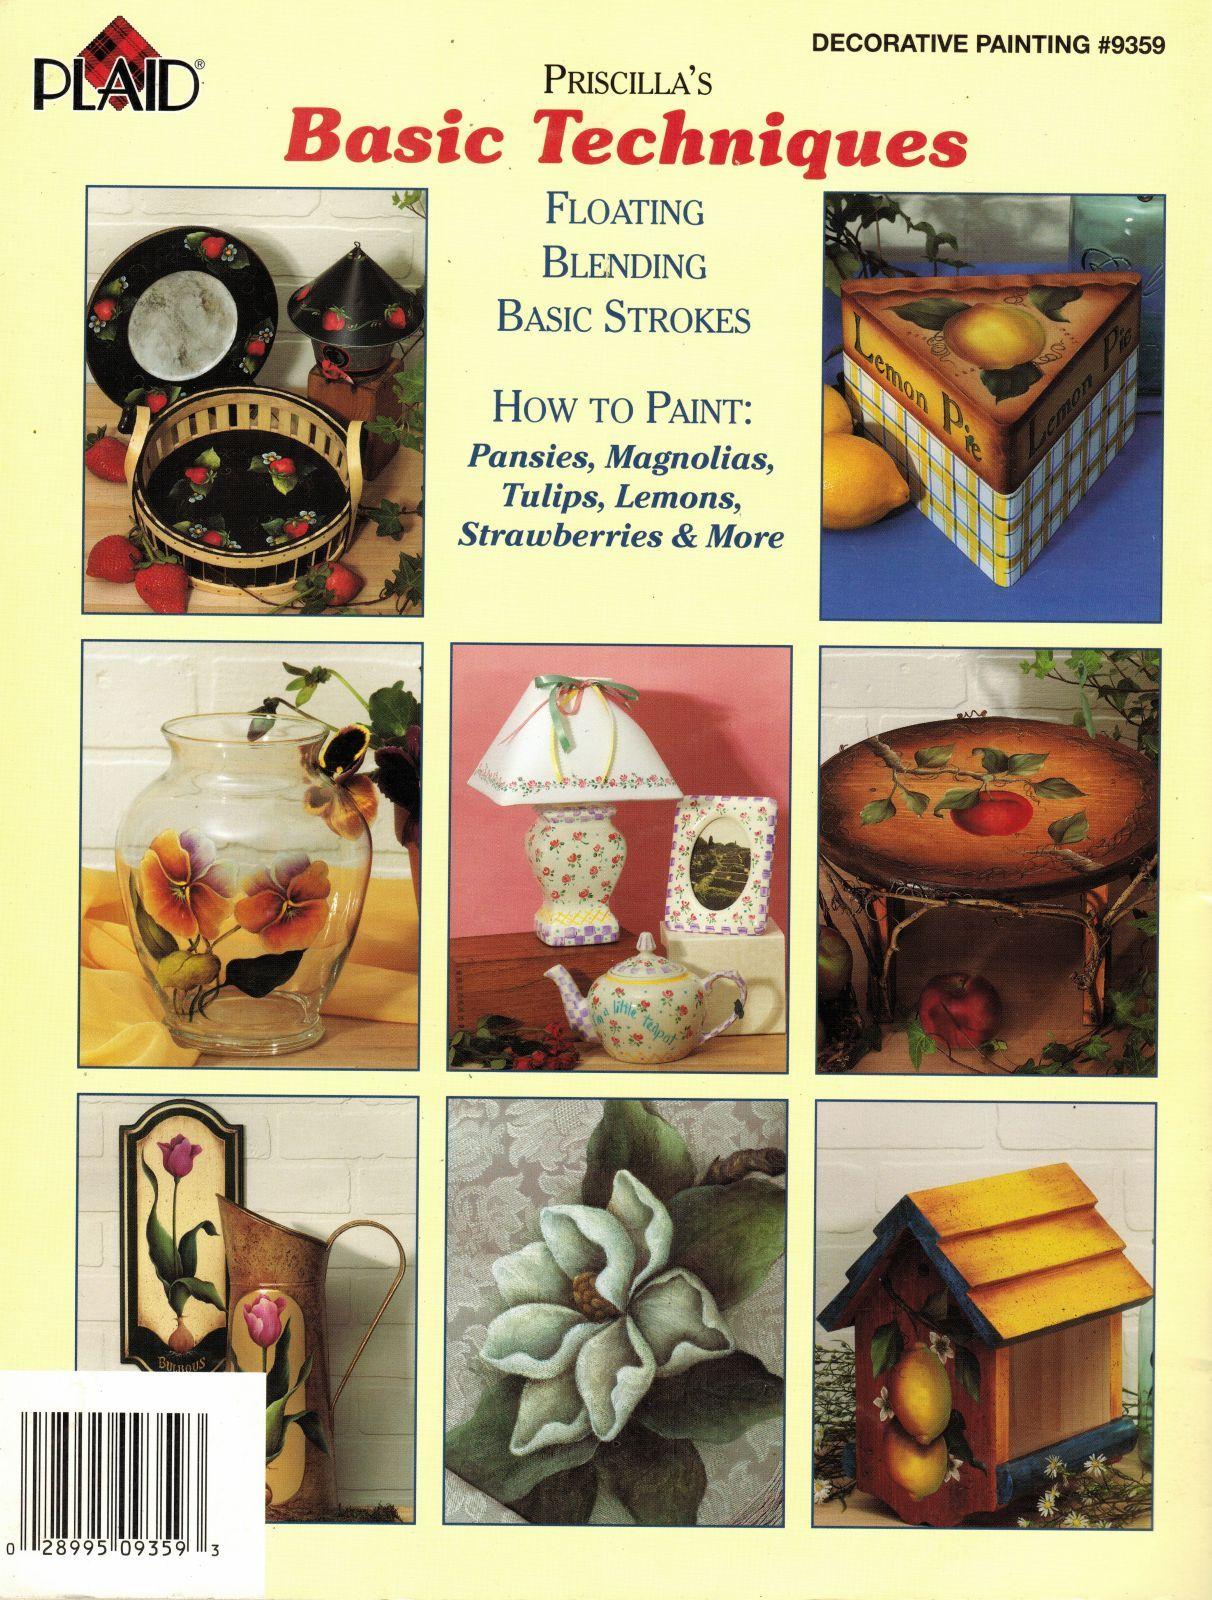 Tole Decorative Painting Priscilla Hauser Floating Blending Techniques Book - $13.99